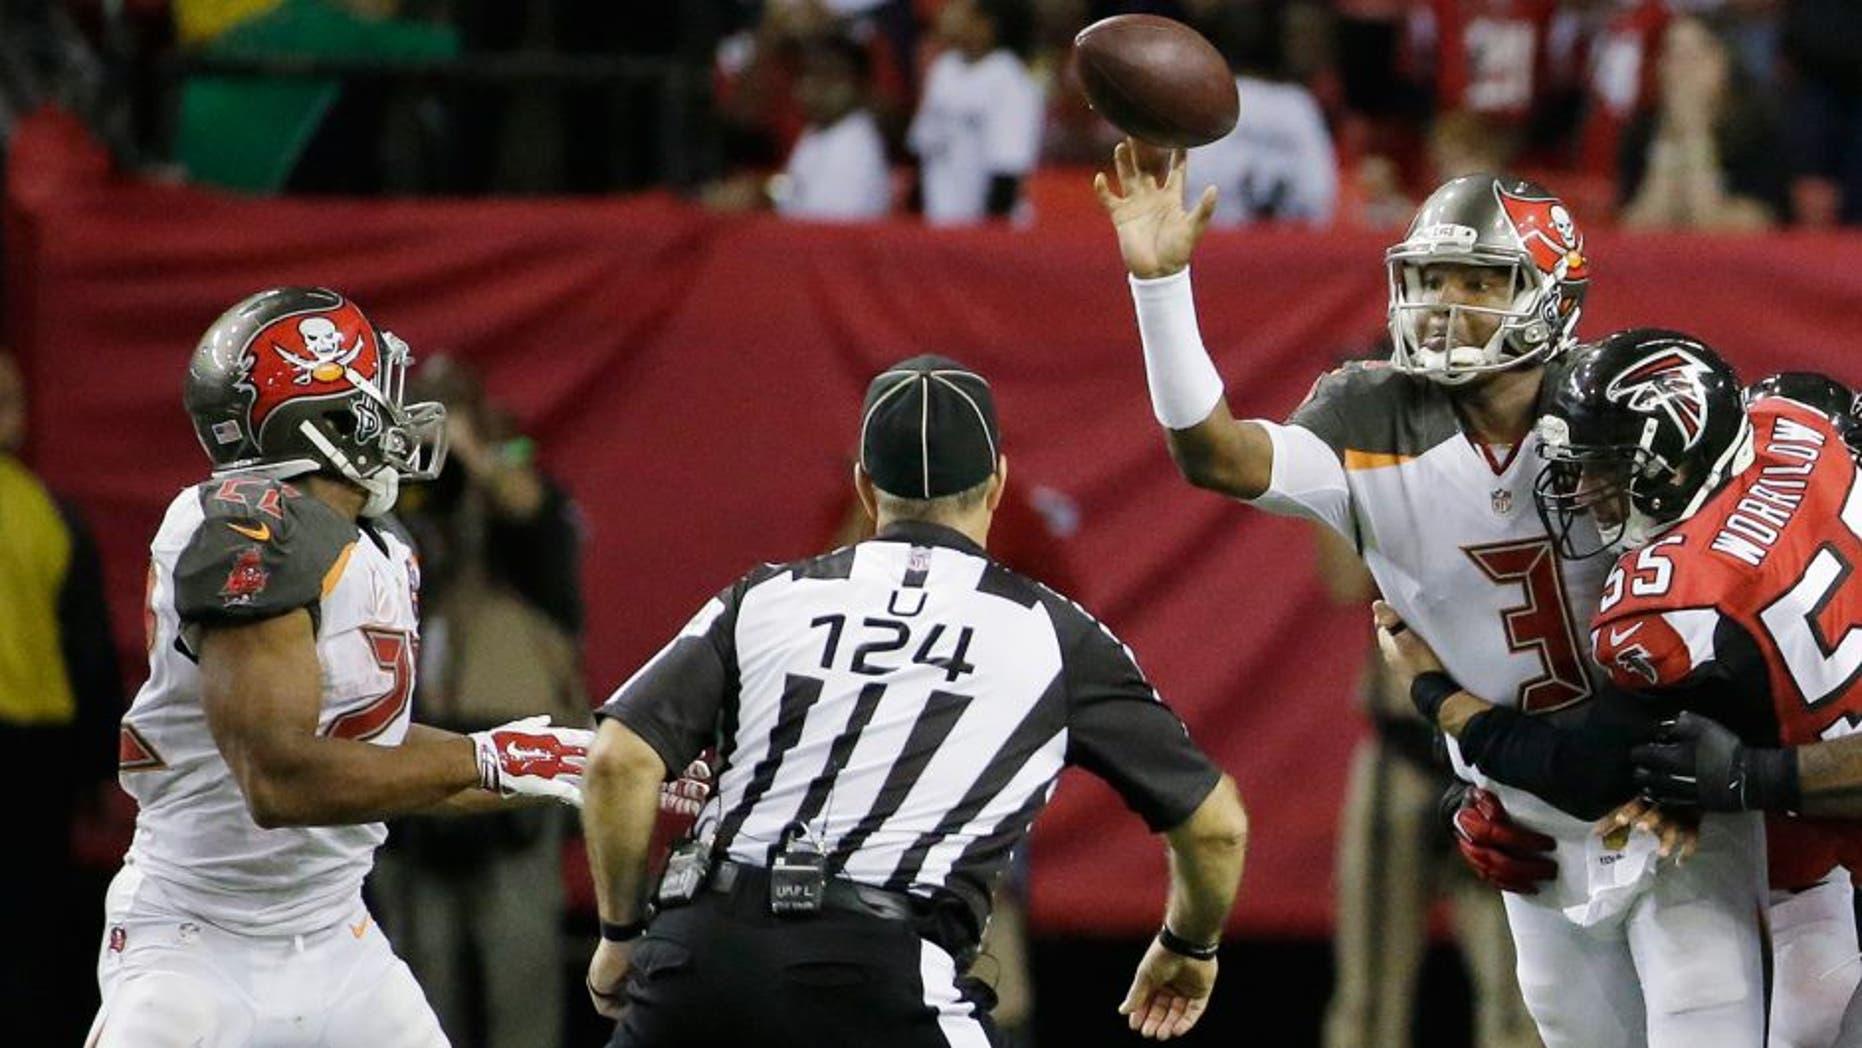 Tampa Bay Buccaneers quarterback Jameis Winston (3) makes the pass to Tampa Bay Buccaneers running back Doug Martin (22) as Atlanta Falcons middle linebacker Paul Worrilow (55) is hitting during the second of an NFL football game, Sunday, Nov. 1, 2015, in Atlanta. (AP Photo/David Goldman)